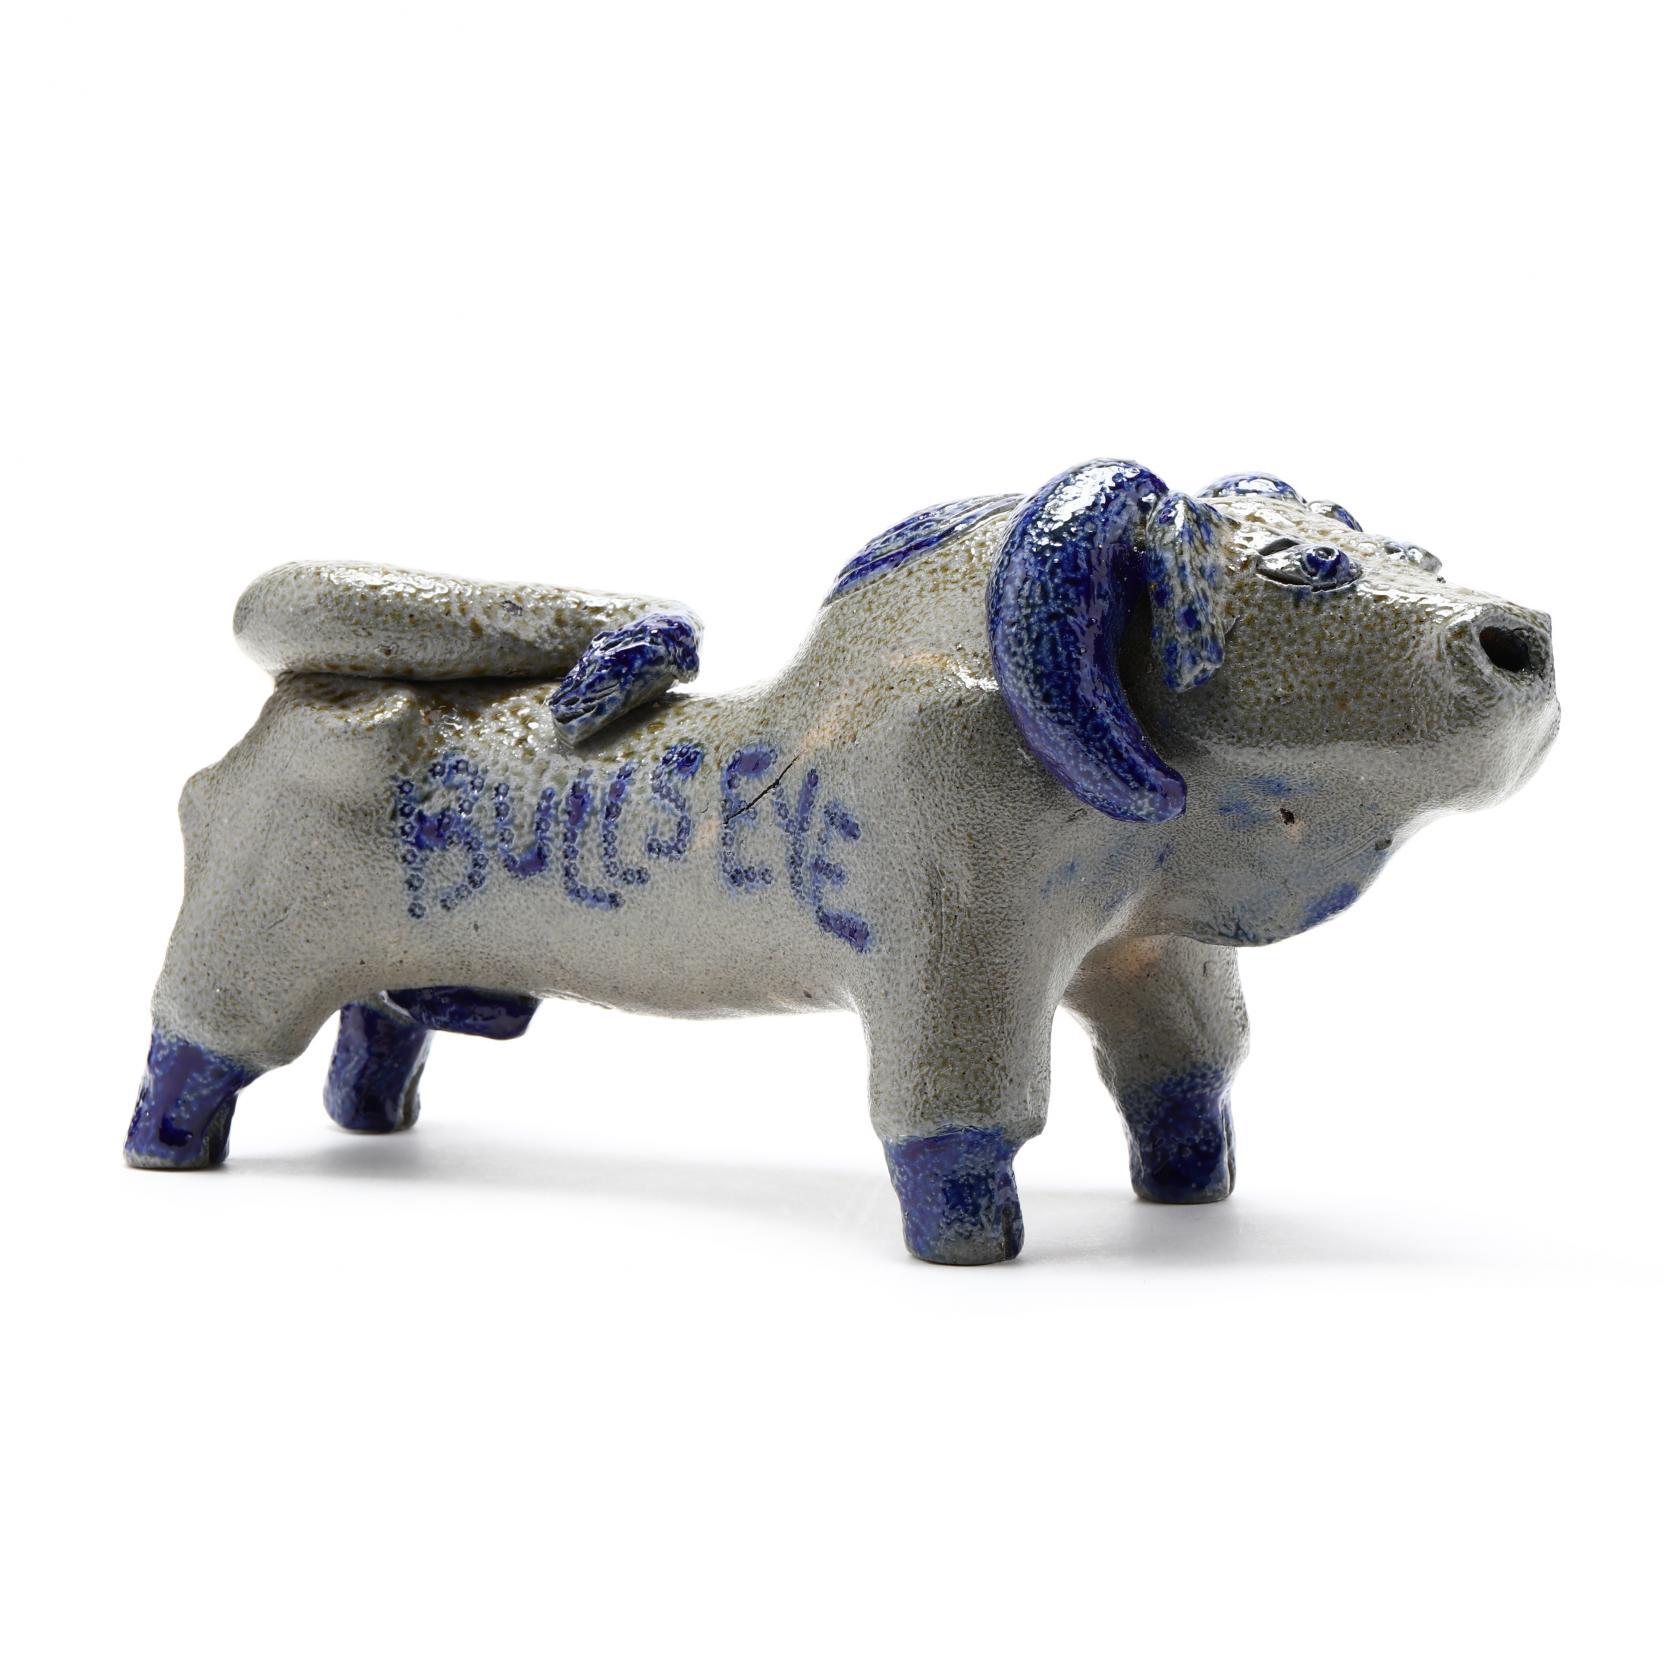 nc-folk-pottery-billy-ray-hussey-i-bulls-eye-i